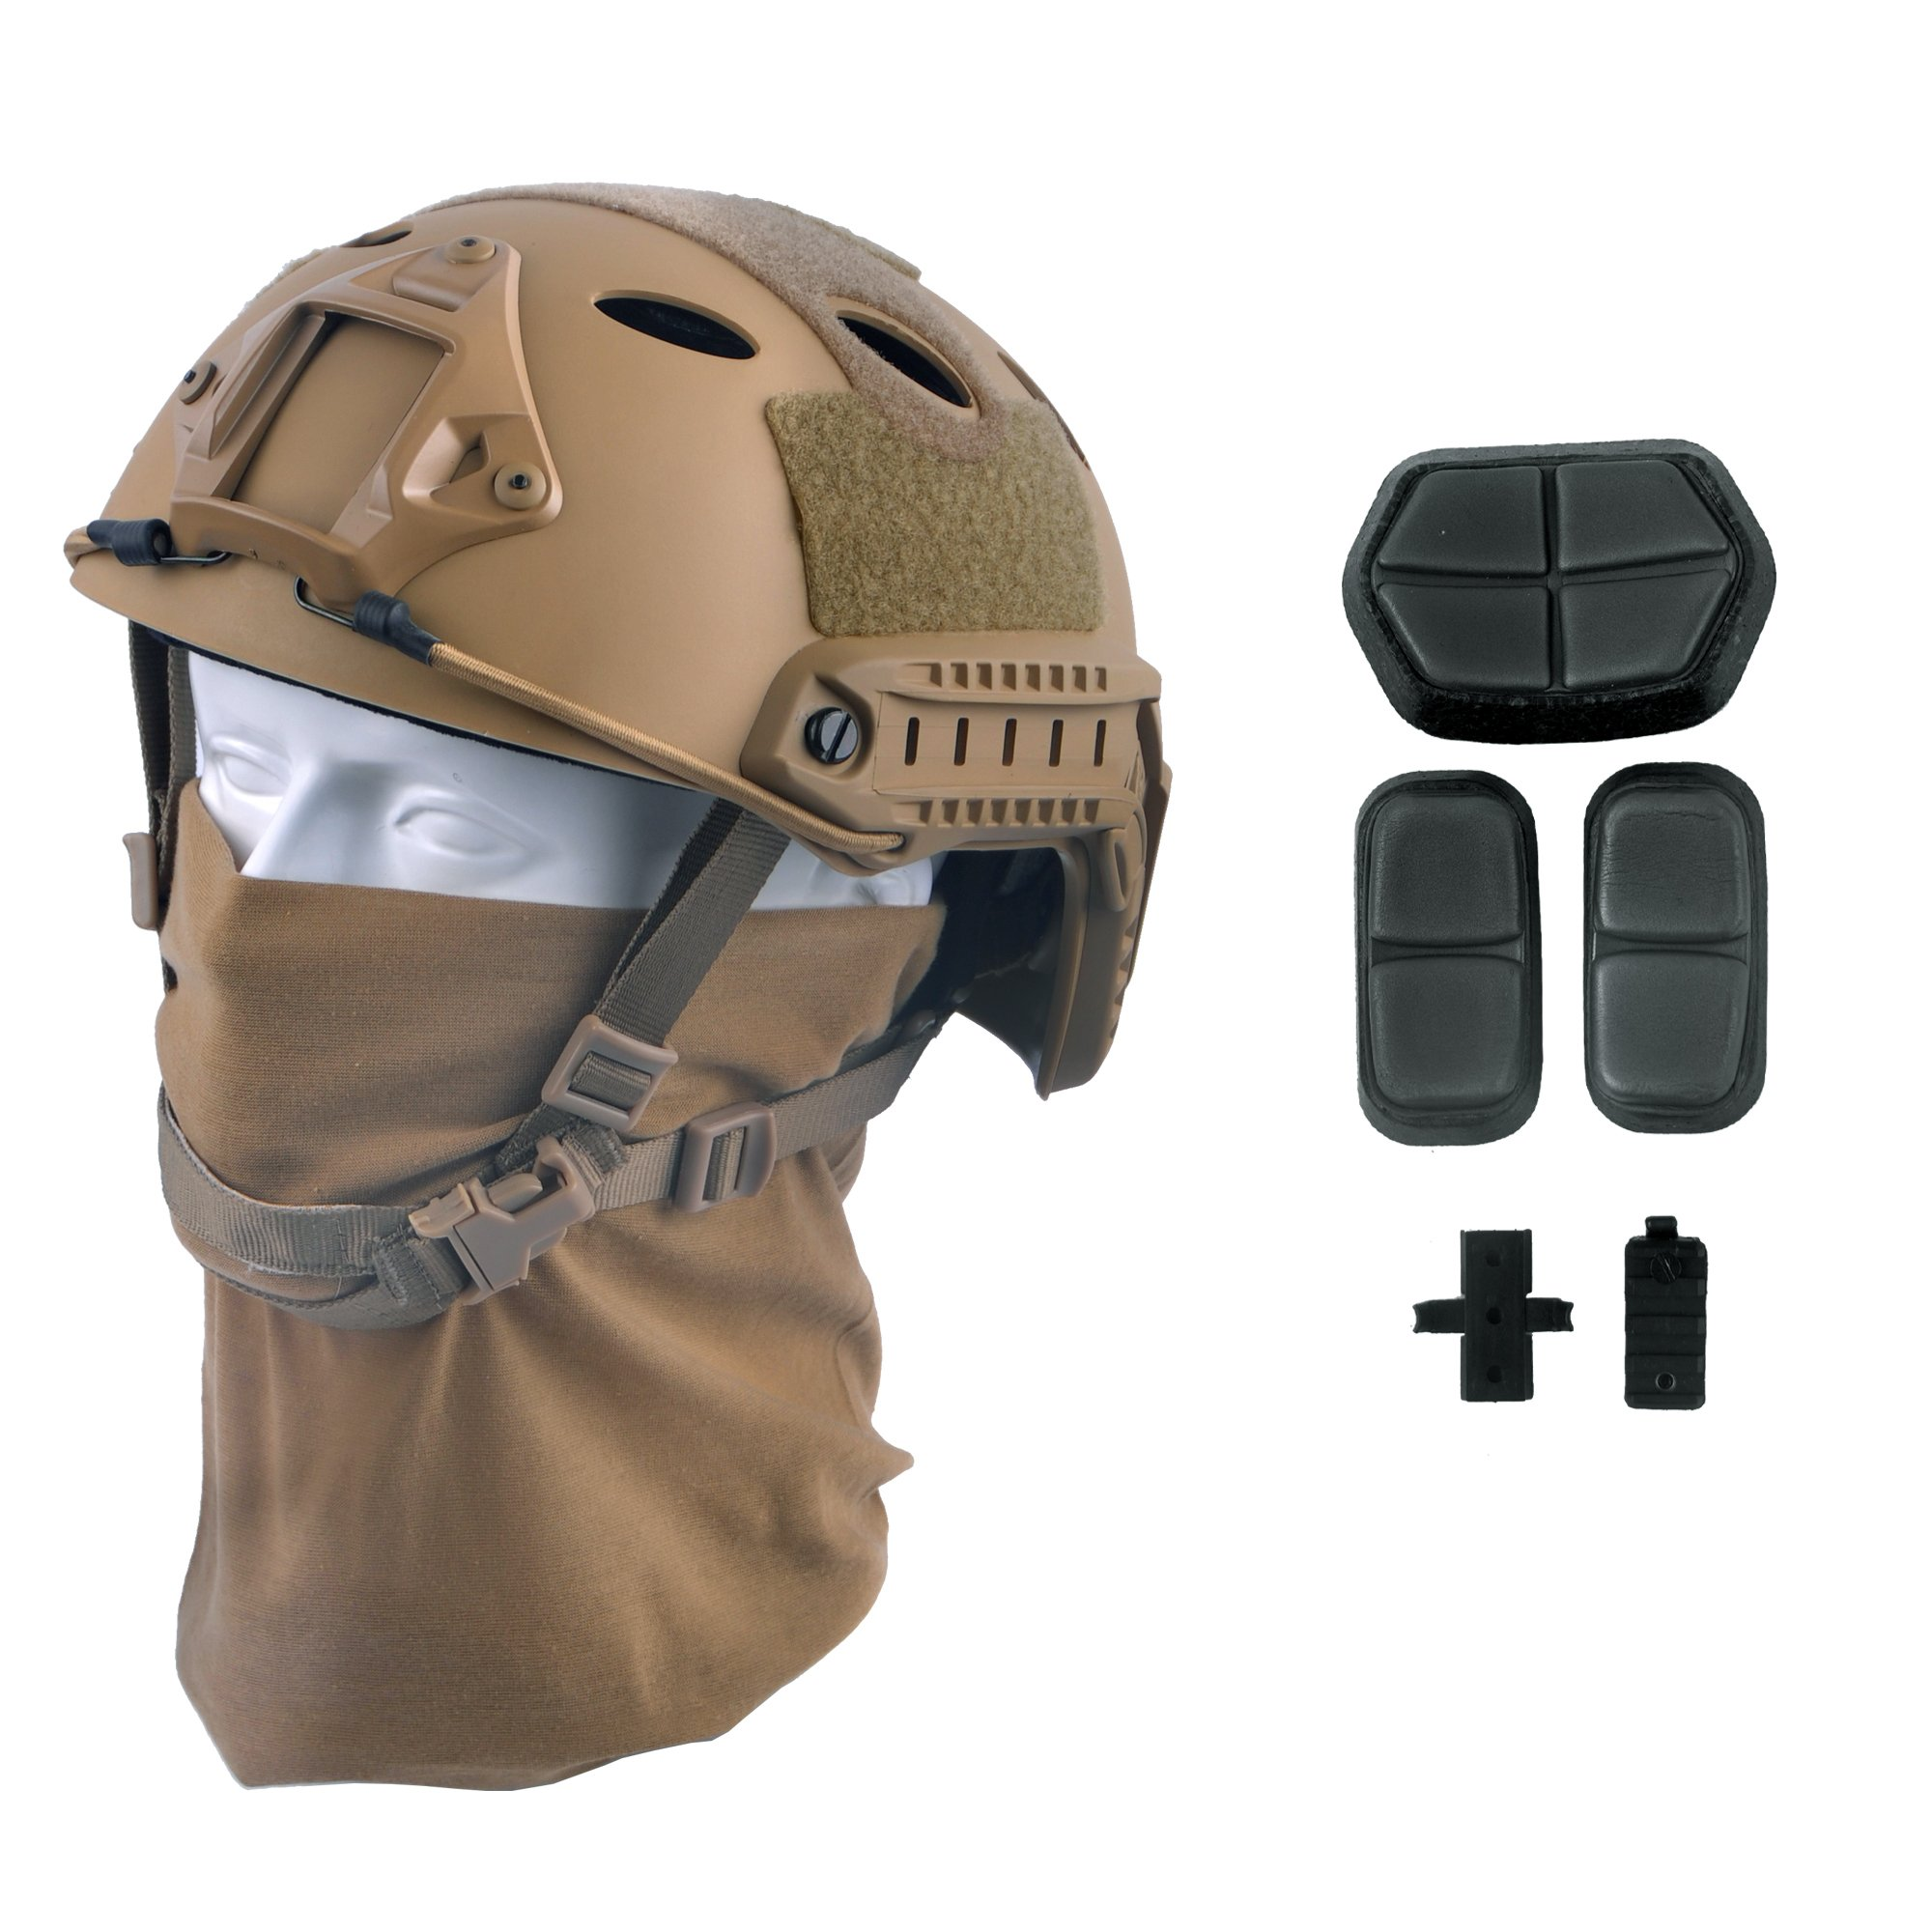 LOOGU Fast PJ Base Jump Military Helmet with 12-in-1 Headwear(TN) by LOOGU